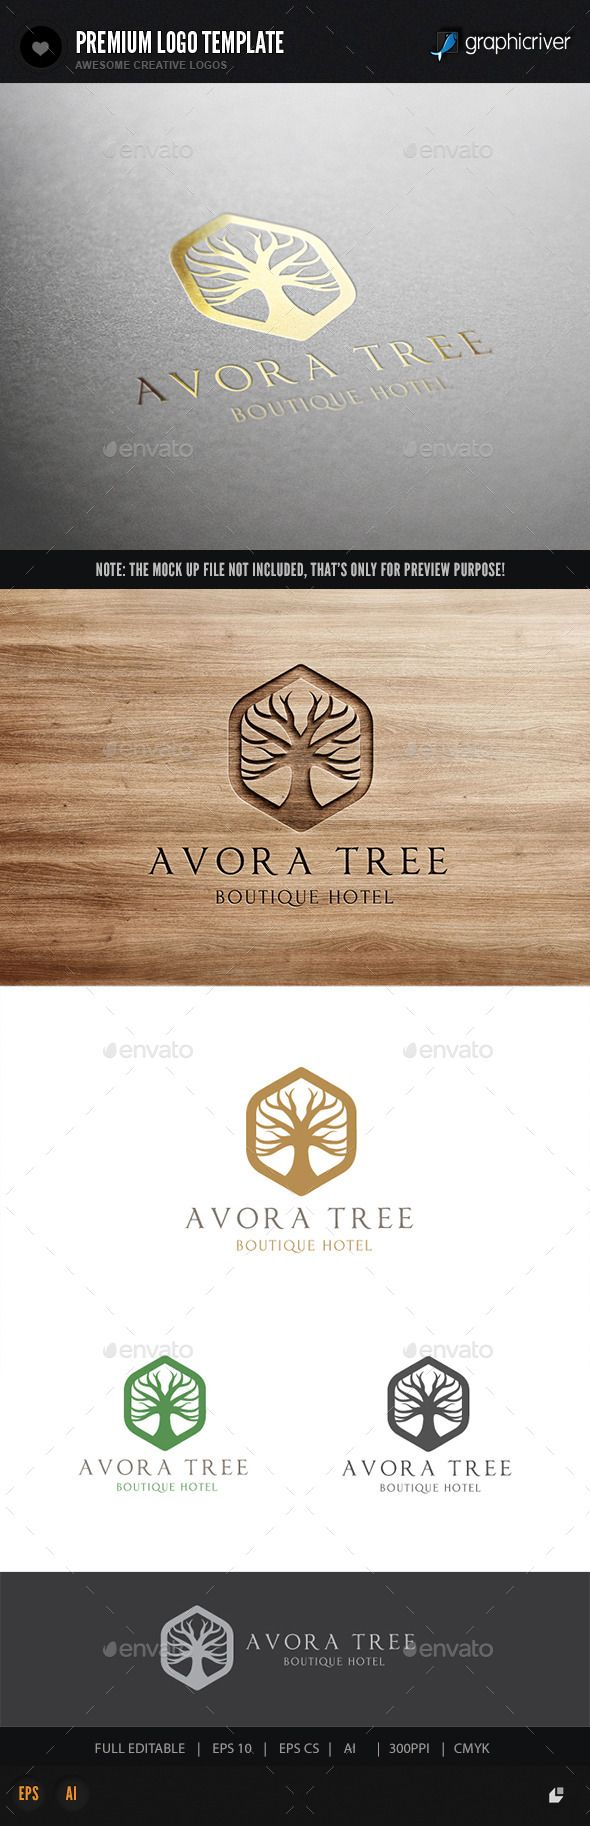 Tree Logo Template #design #logotype Download: http://graphicriver.net/item/tree-logo/10717202?ref=ksioks